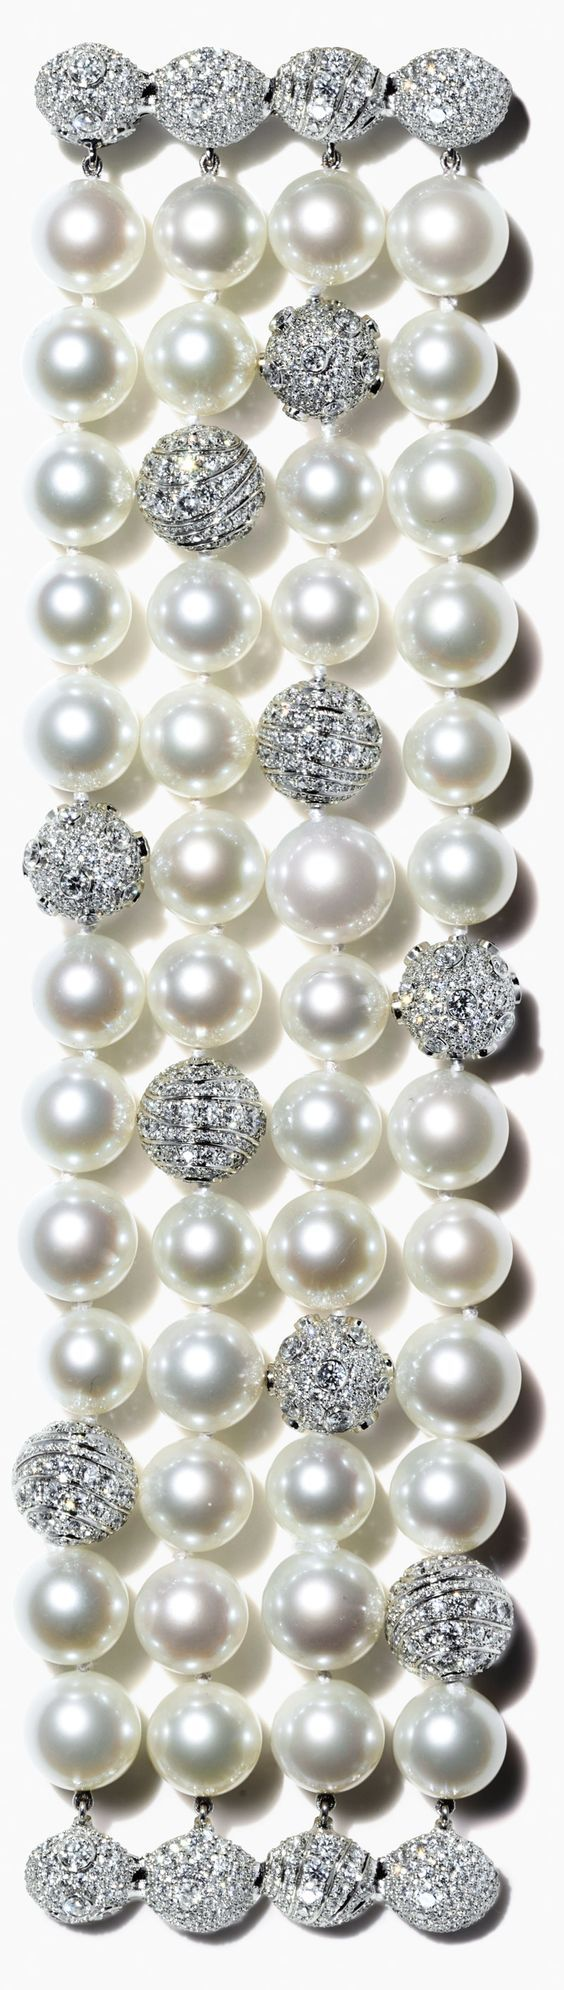 Rosamaria G Frangini | High Pearl Jewellery | Tiffany's finest pearls.